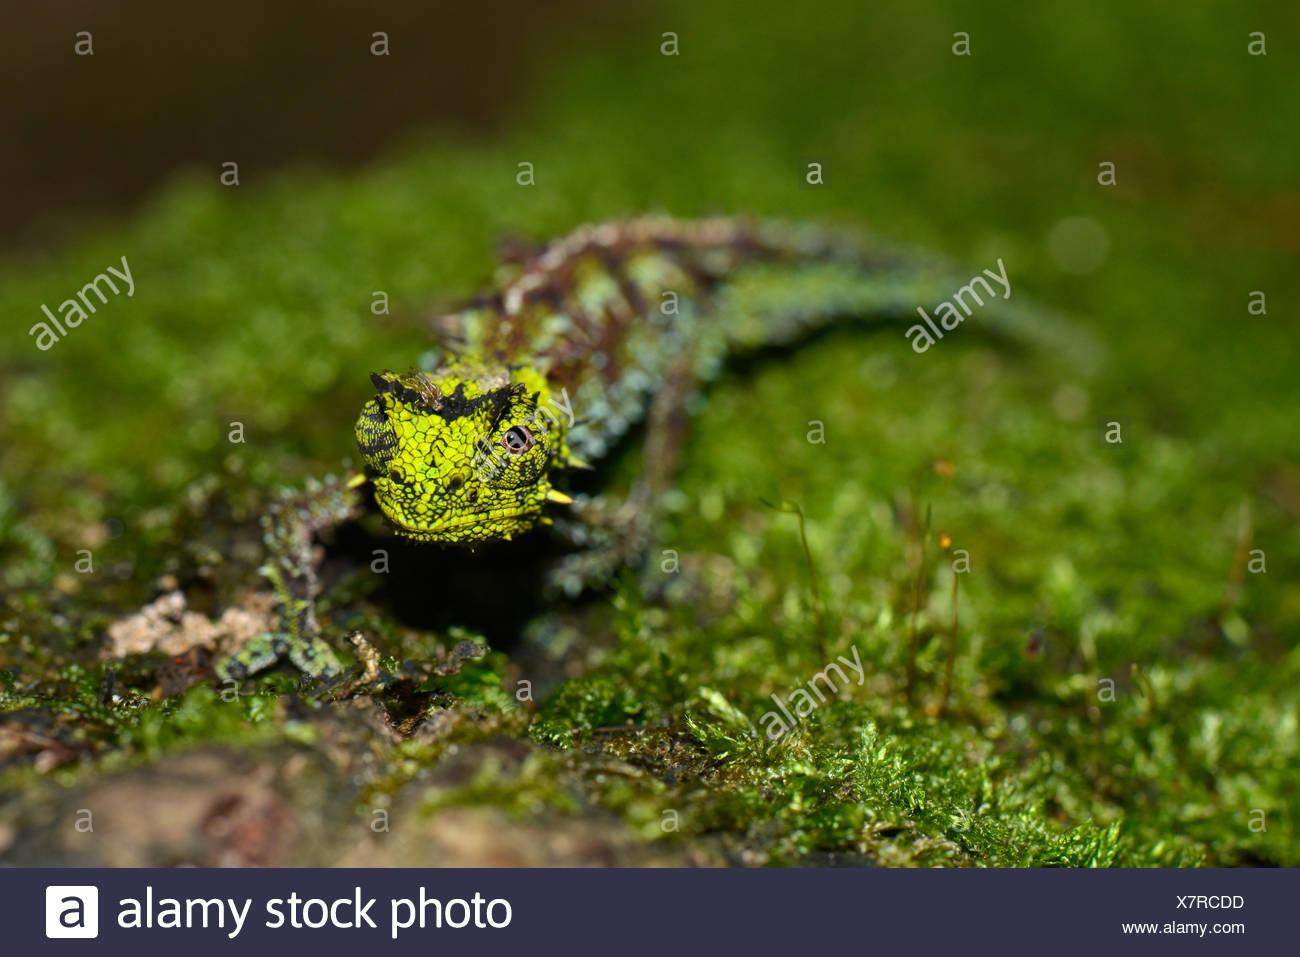 Iaraka River Leaf Chameleon (Brookesia vadoni), male in the rainforests of Marojejy National Park, Madagascar - Stock Image